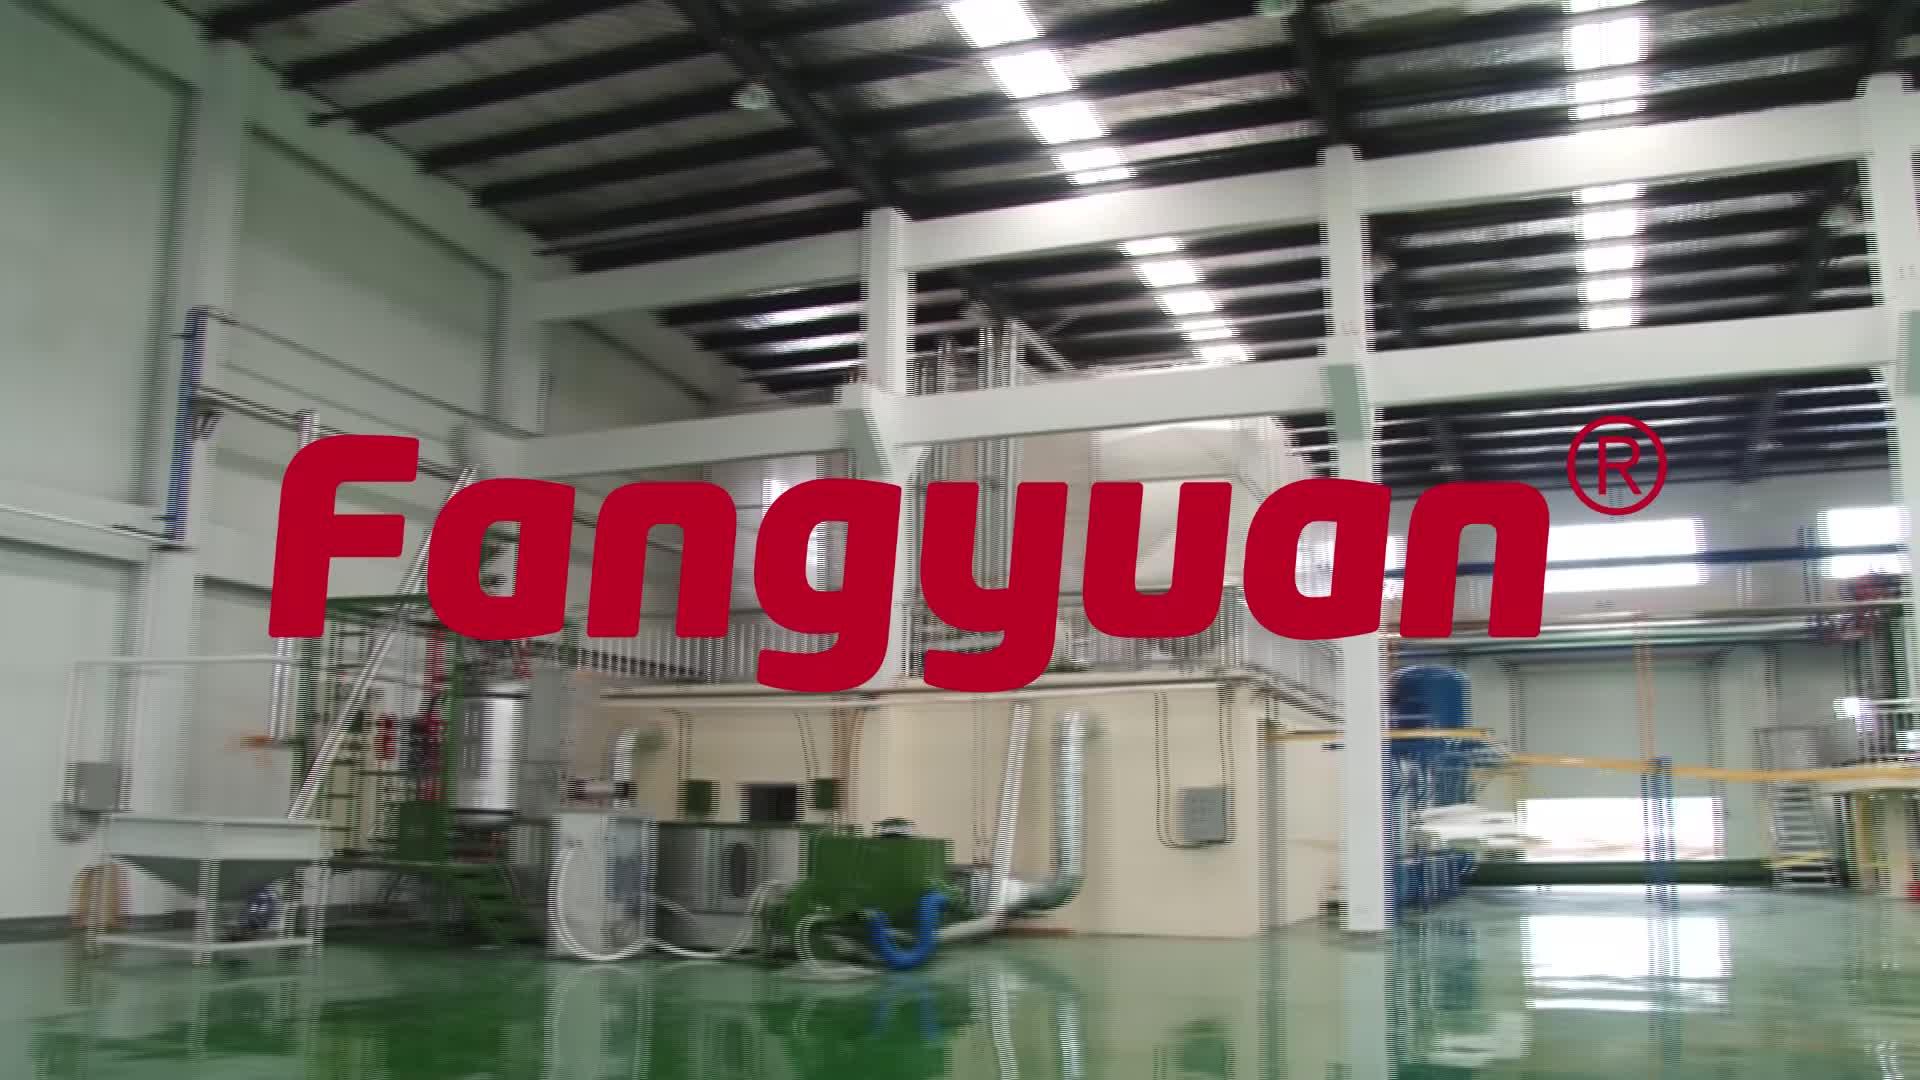 Fangyuan वैक्यूम पैकेजिंग polystyrene परिवहन polystyrene सुरक्षात्मक बक्से फोम बनाने उत्पादन लाइन मशीनरी